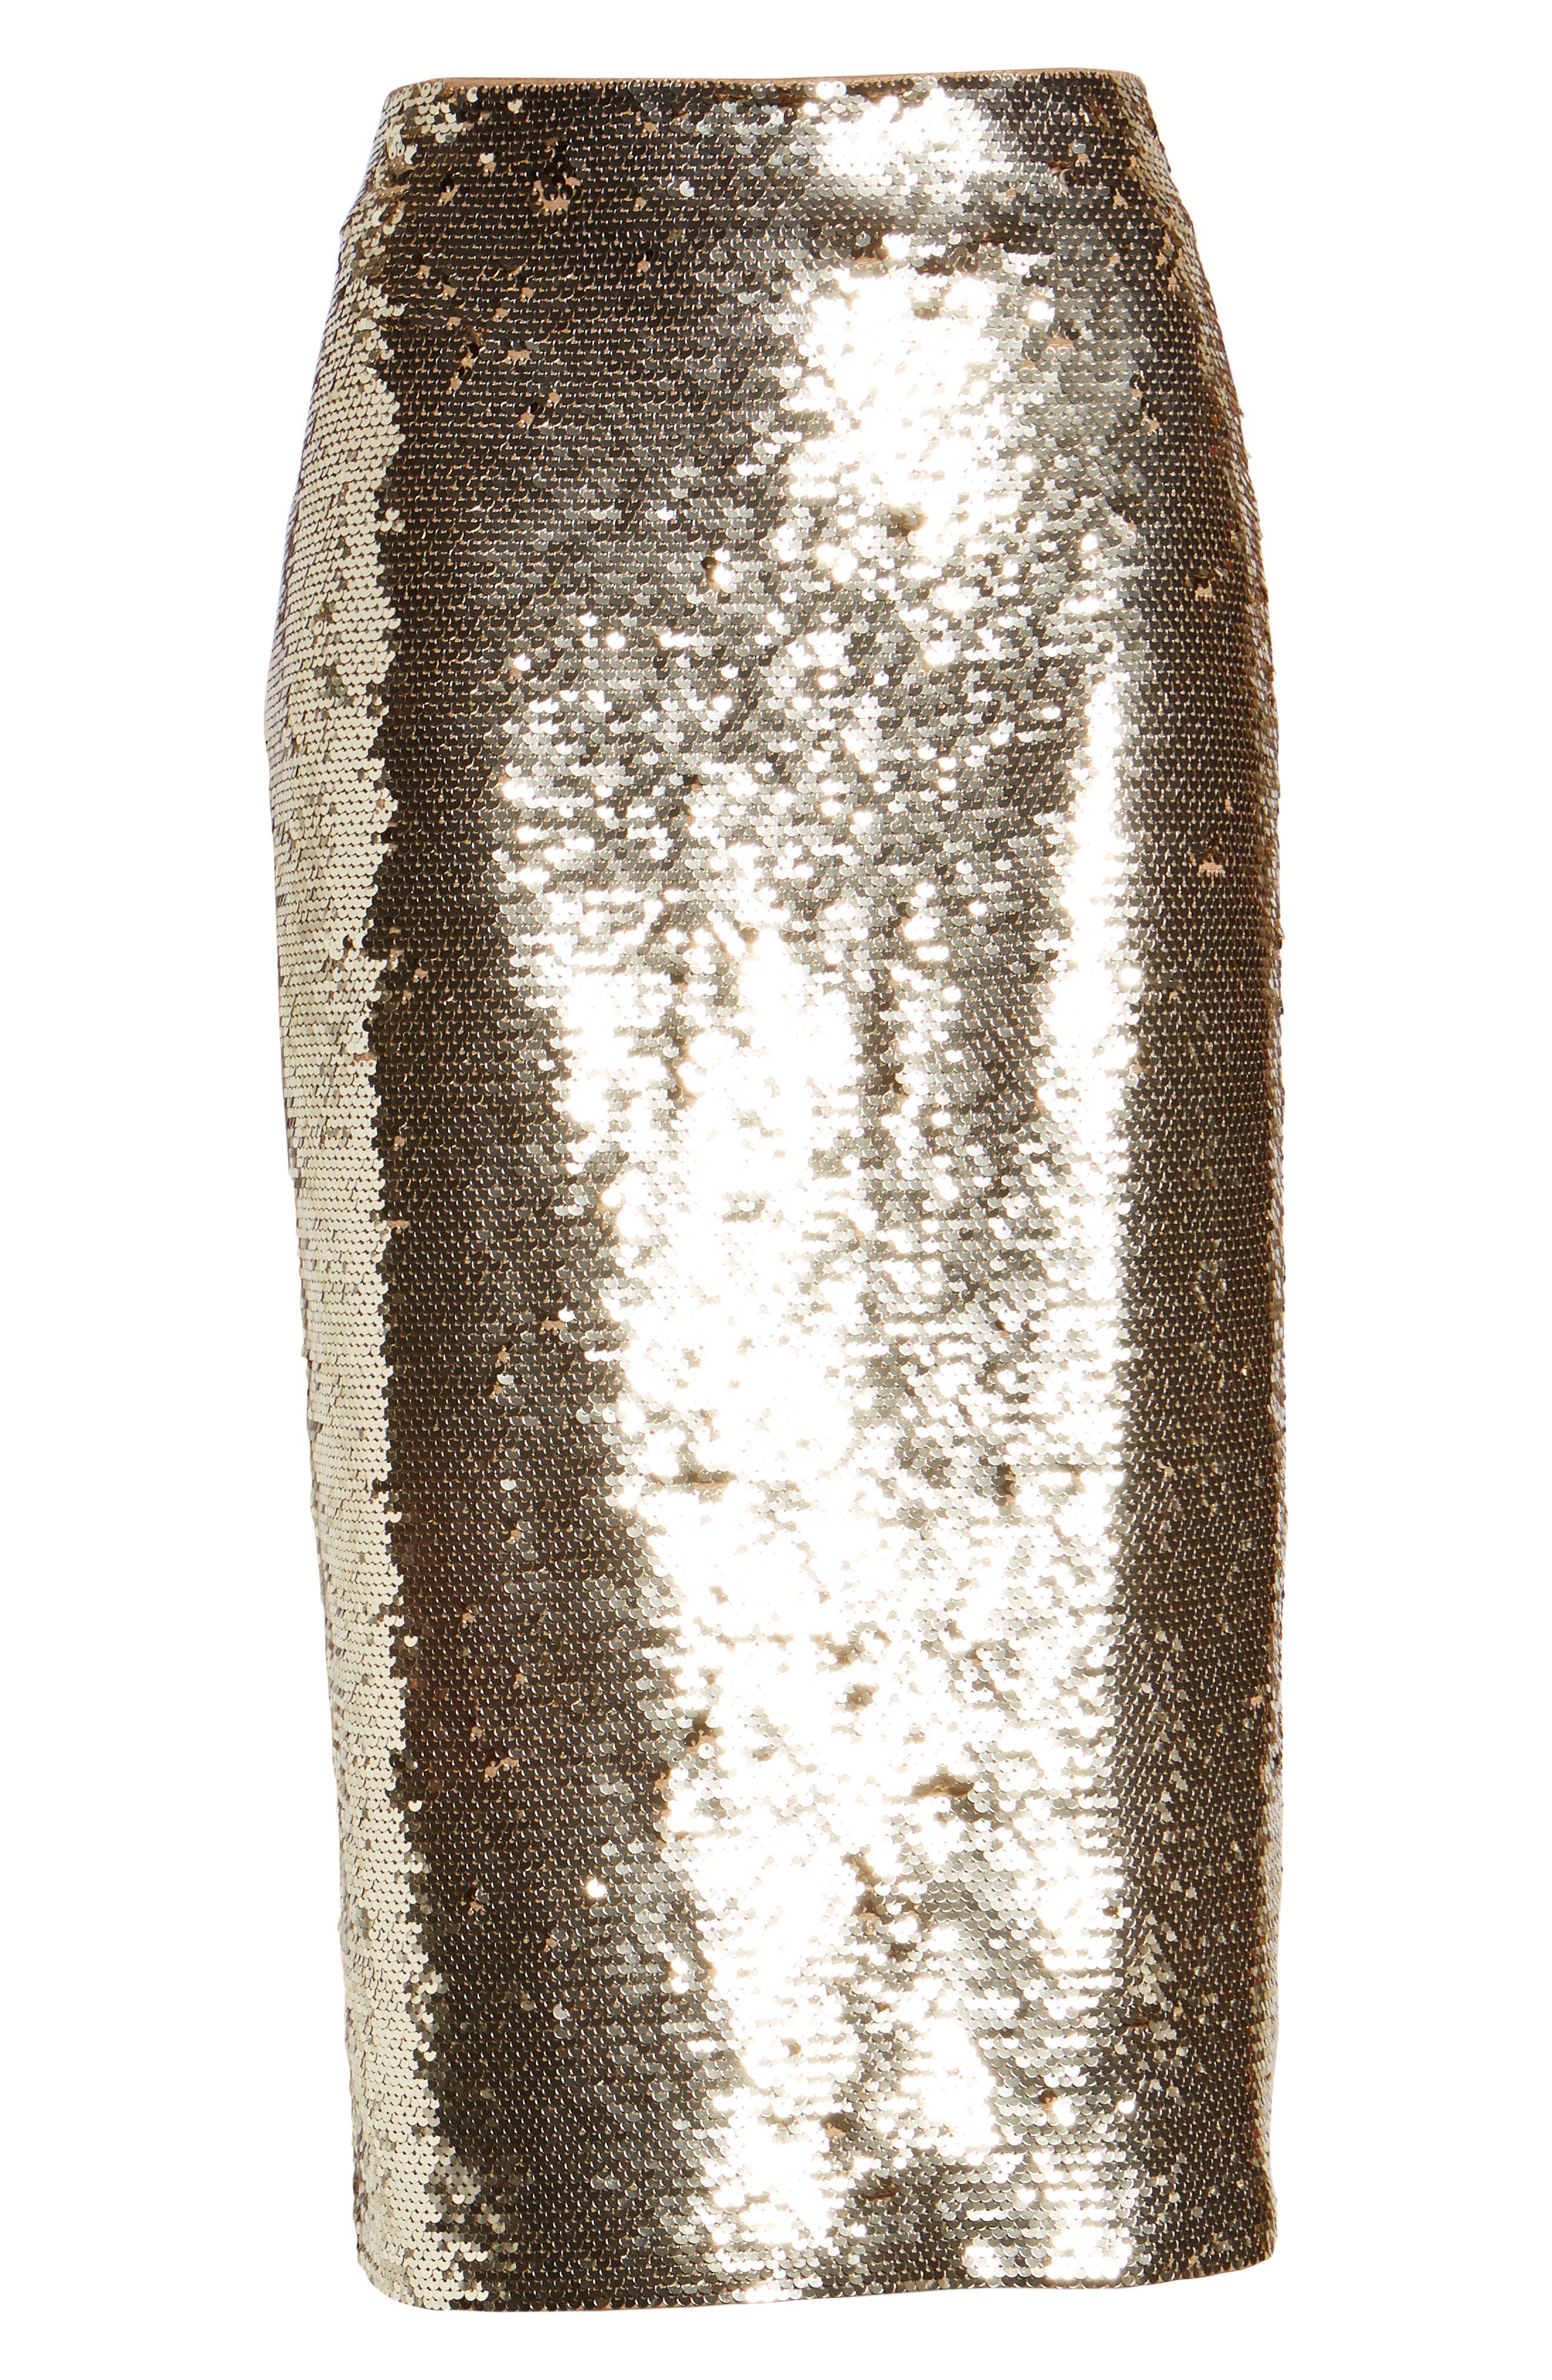 Sequin Pencil Skirt,                             Alternate thumbnail 6, color,                             GOLD